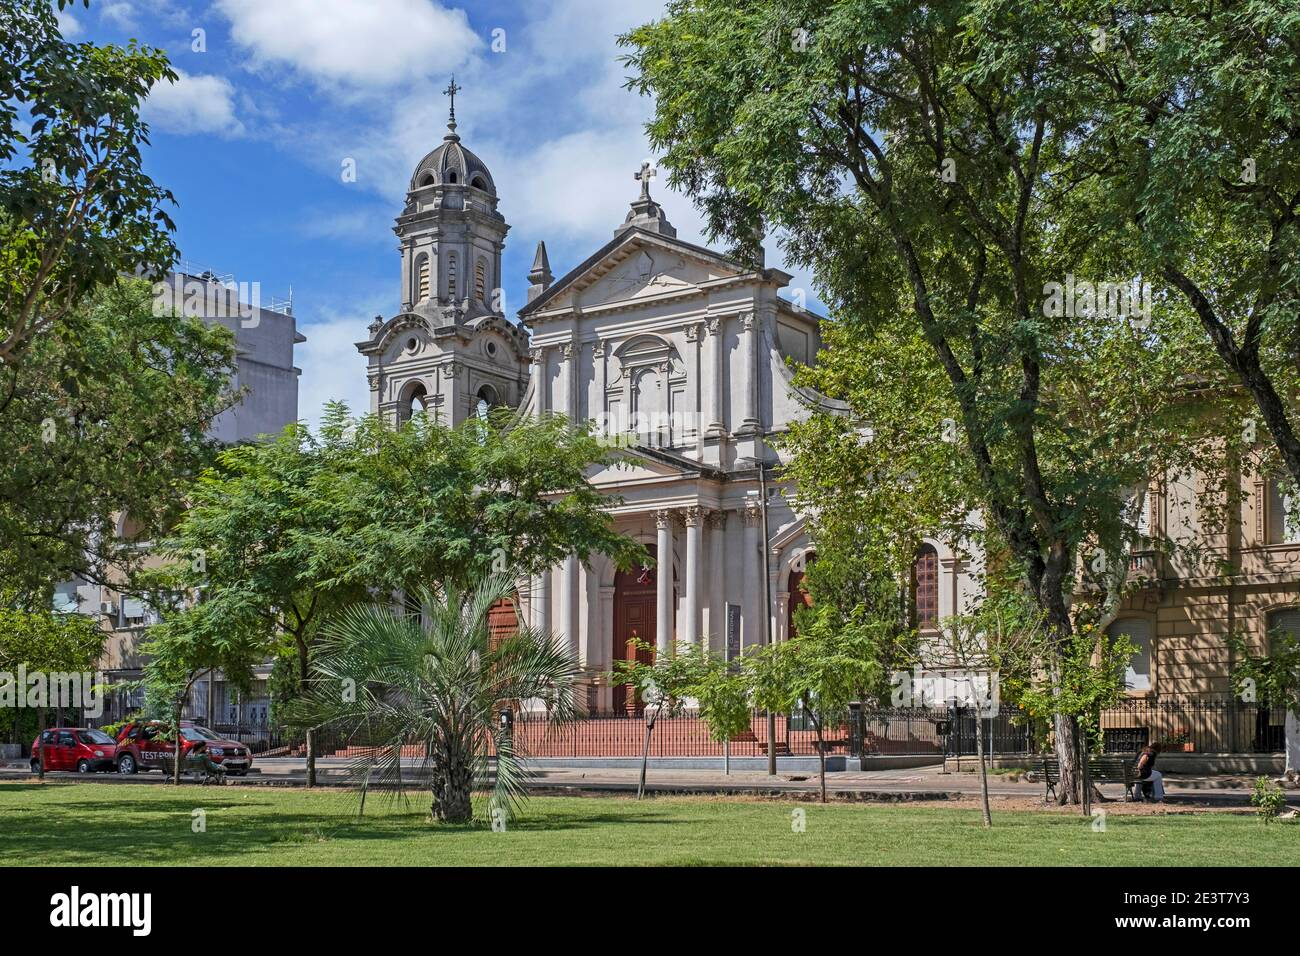 Cathedral of Salto, Roman Catholic church dedicated to saint John the Baptist at the Plaza Artigas in the city Salto, northwestern Uruguay Stock Photo